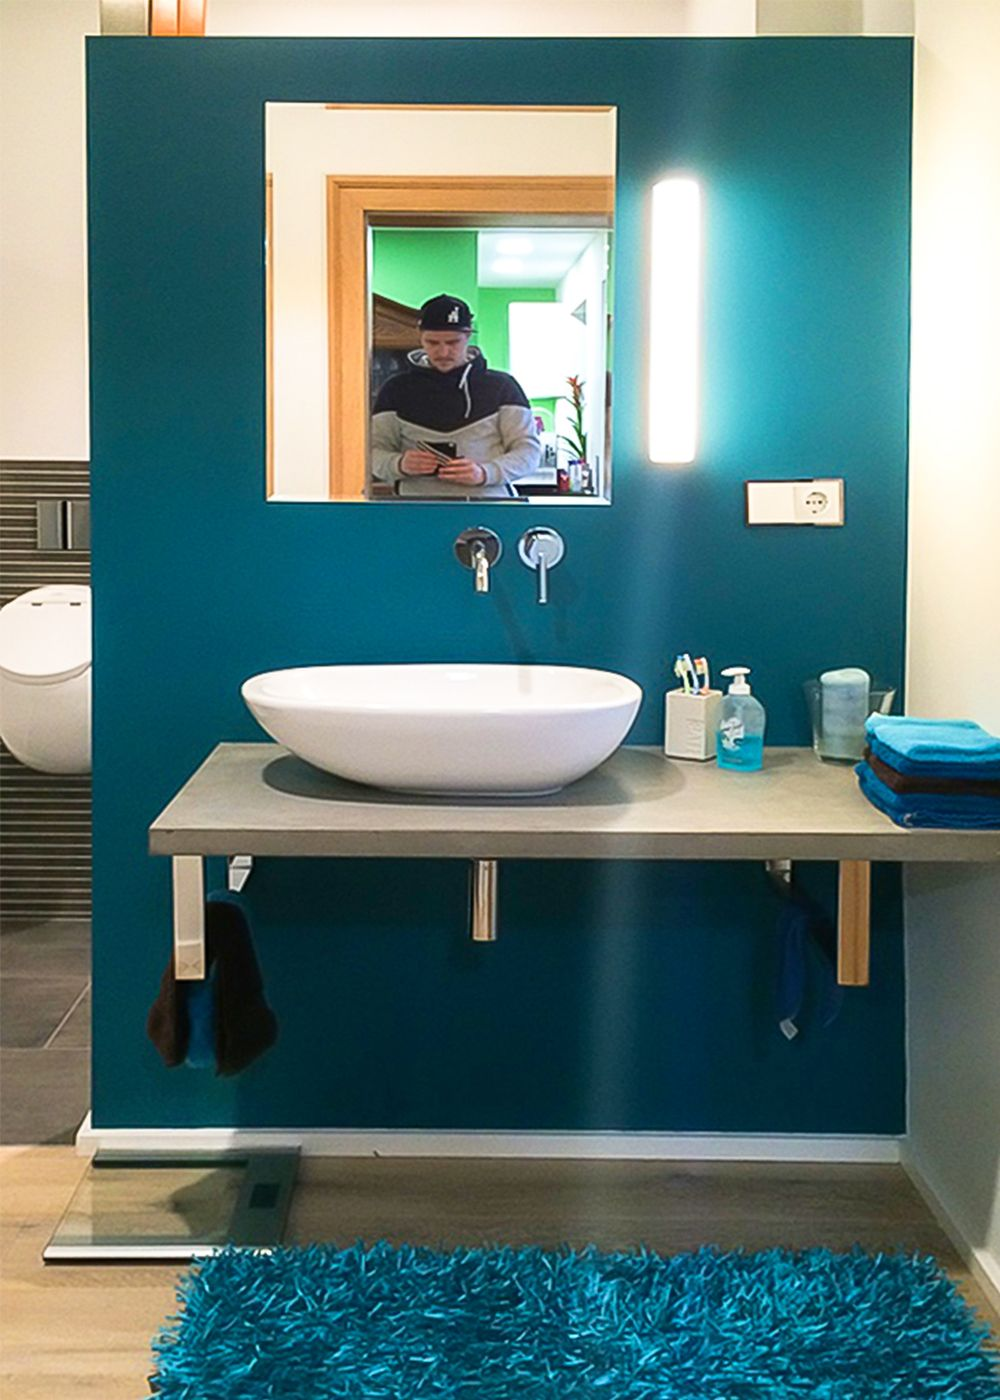 Uberlegen Schmuckwand Im Badezimmer Petrol Wandgestaltung Hingucker Türkis